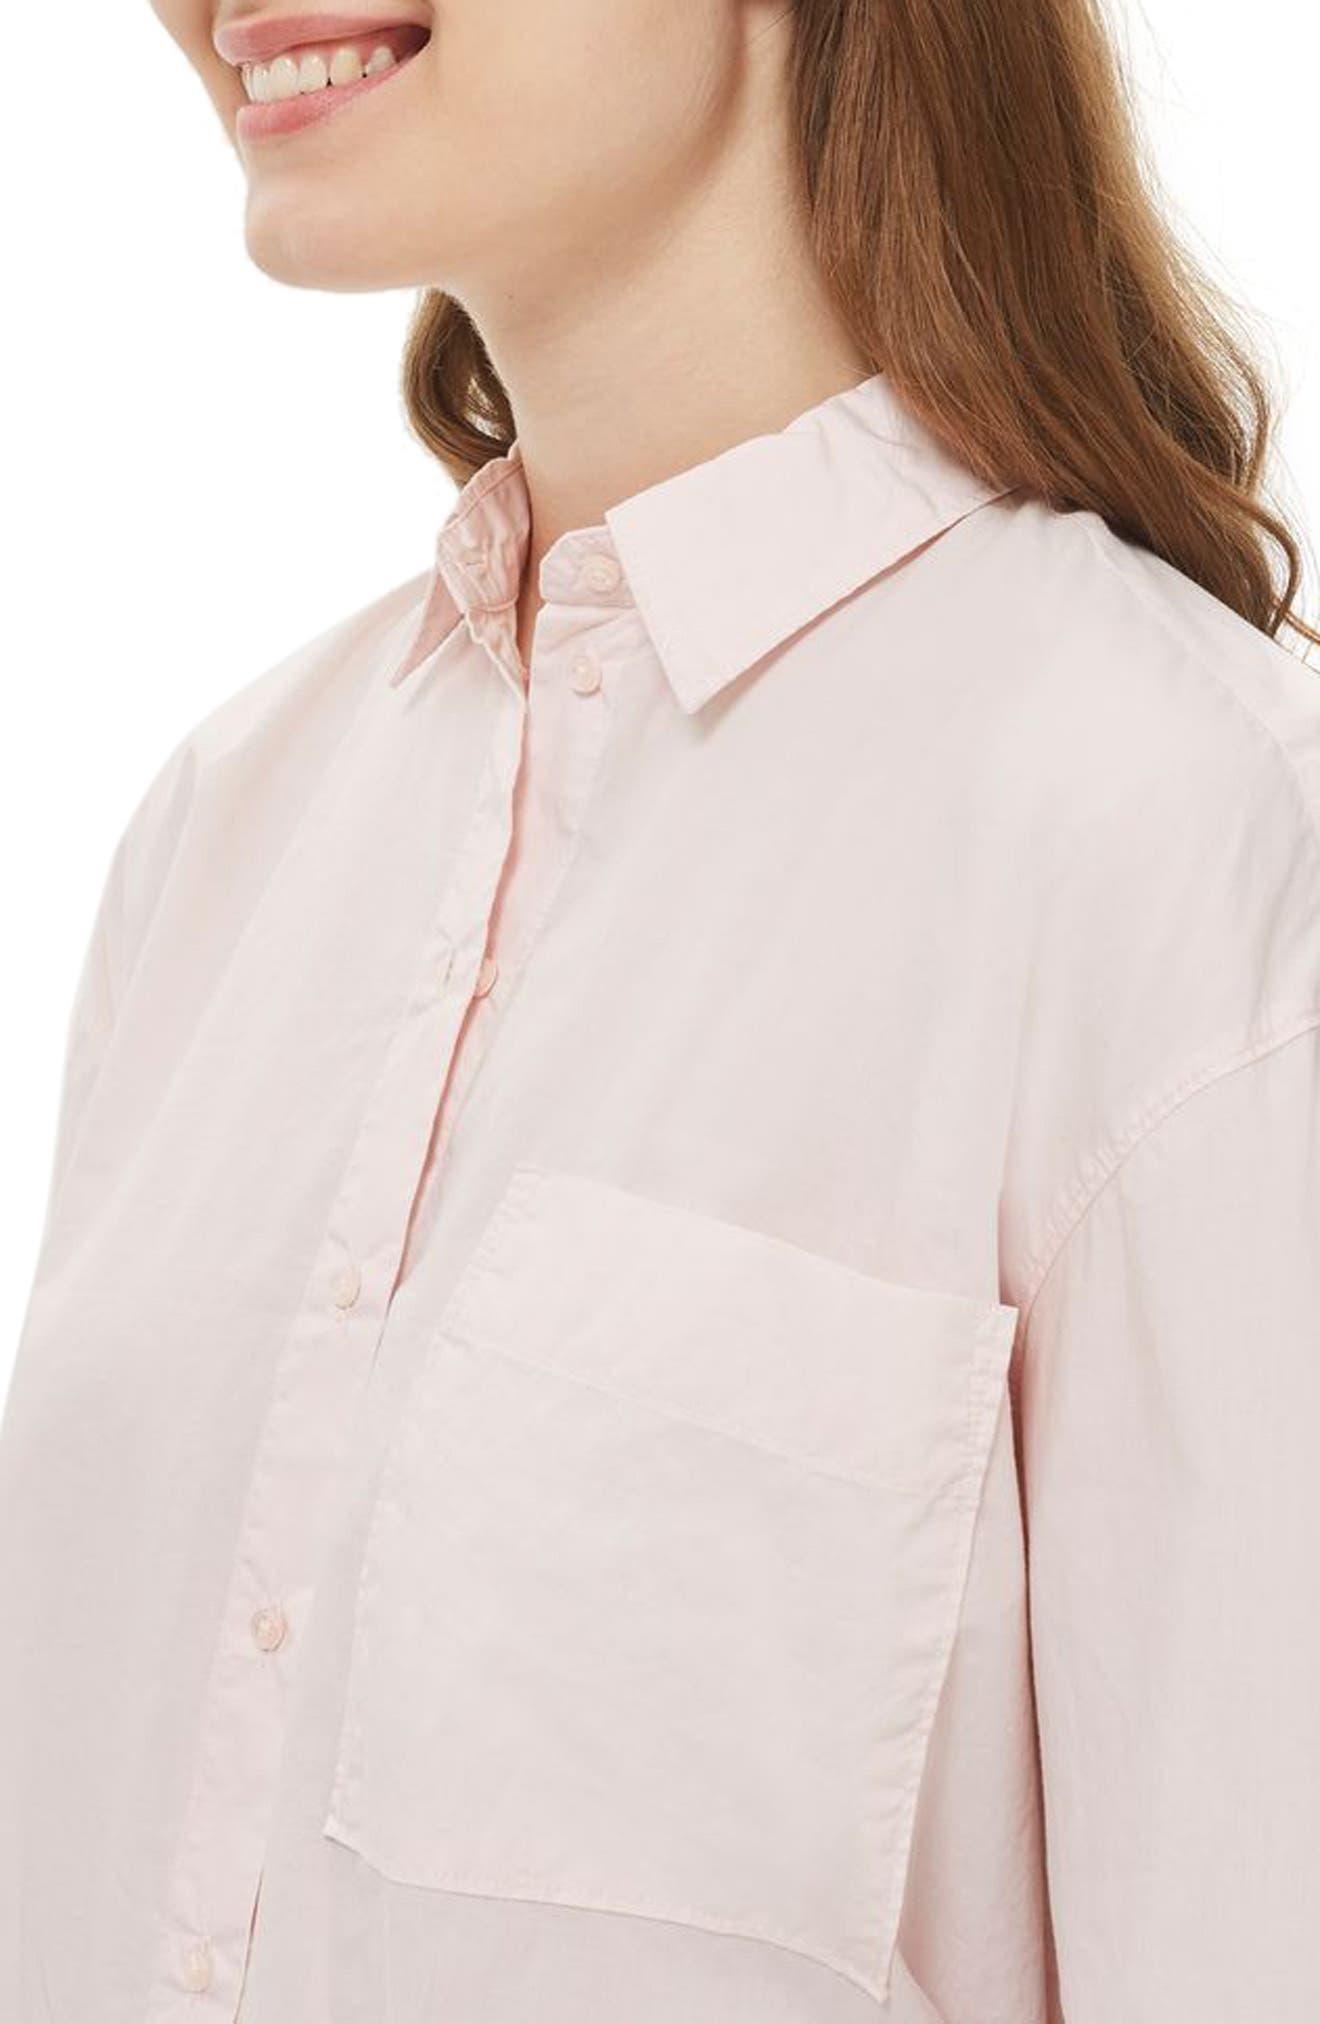 TOPSHOP, Olly Oversize Poplin Shirt, Alternate thumbnail 3, color, 680